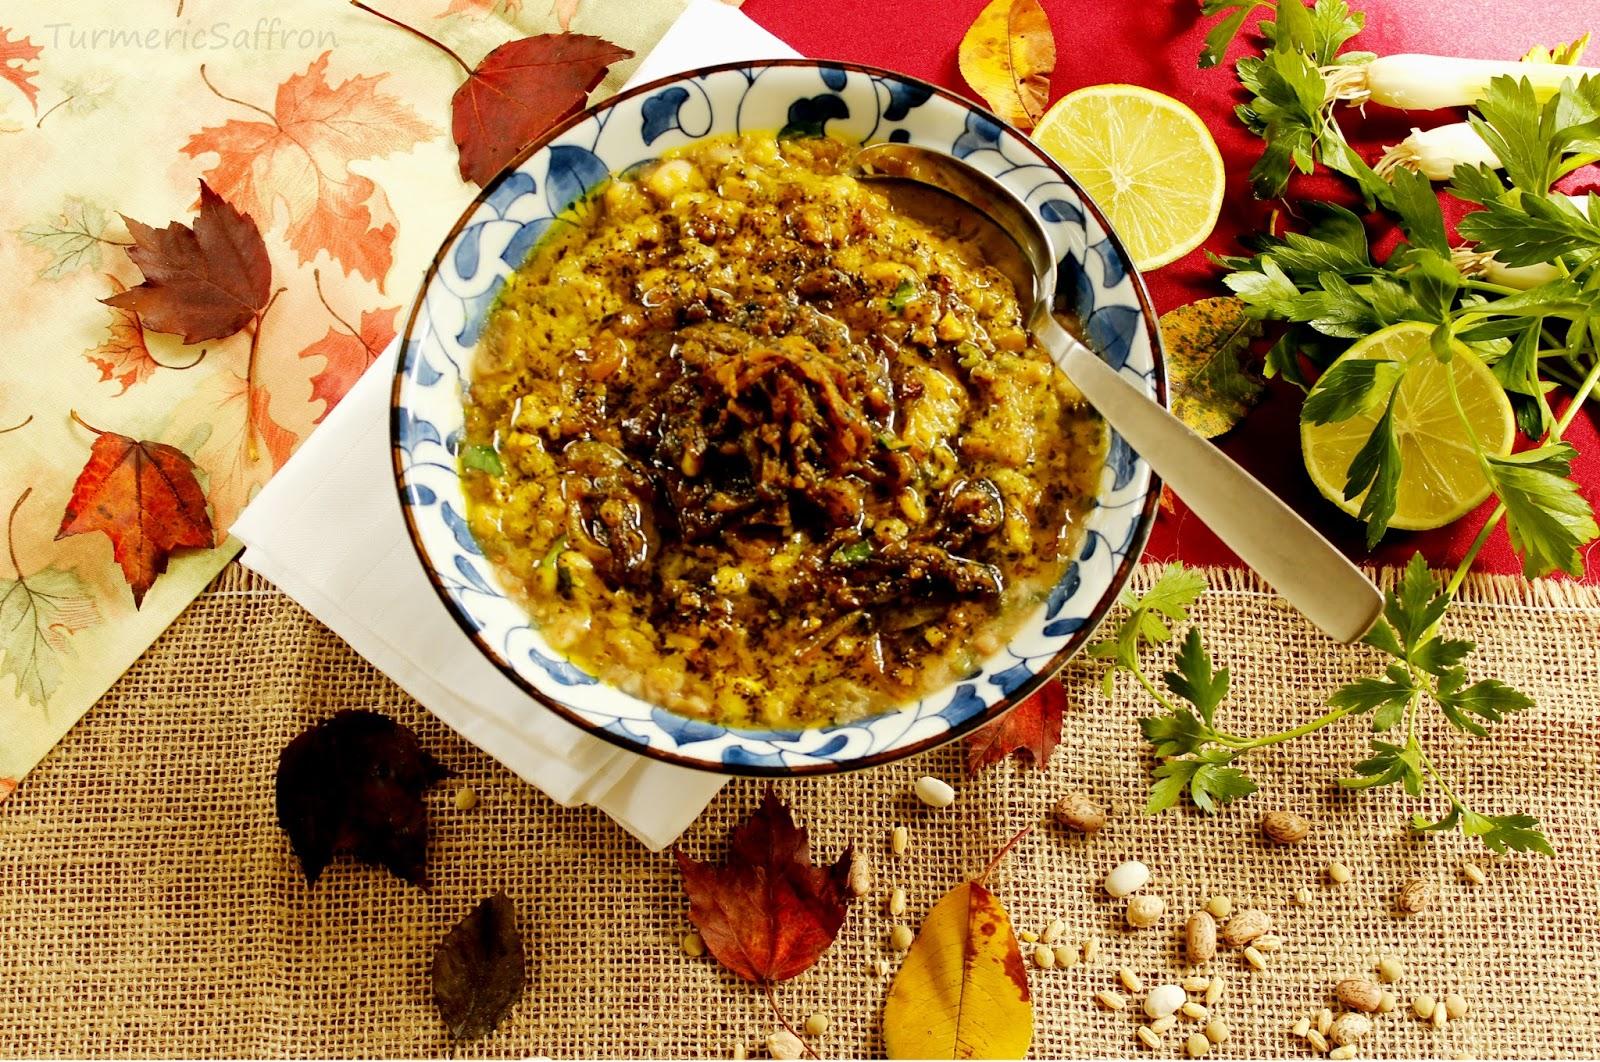 Turmeric saffron for Ancient persian cuisine